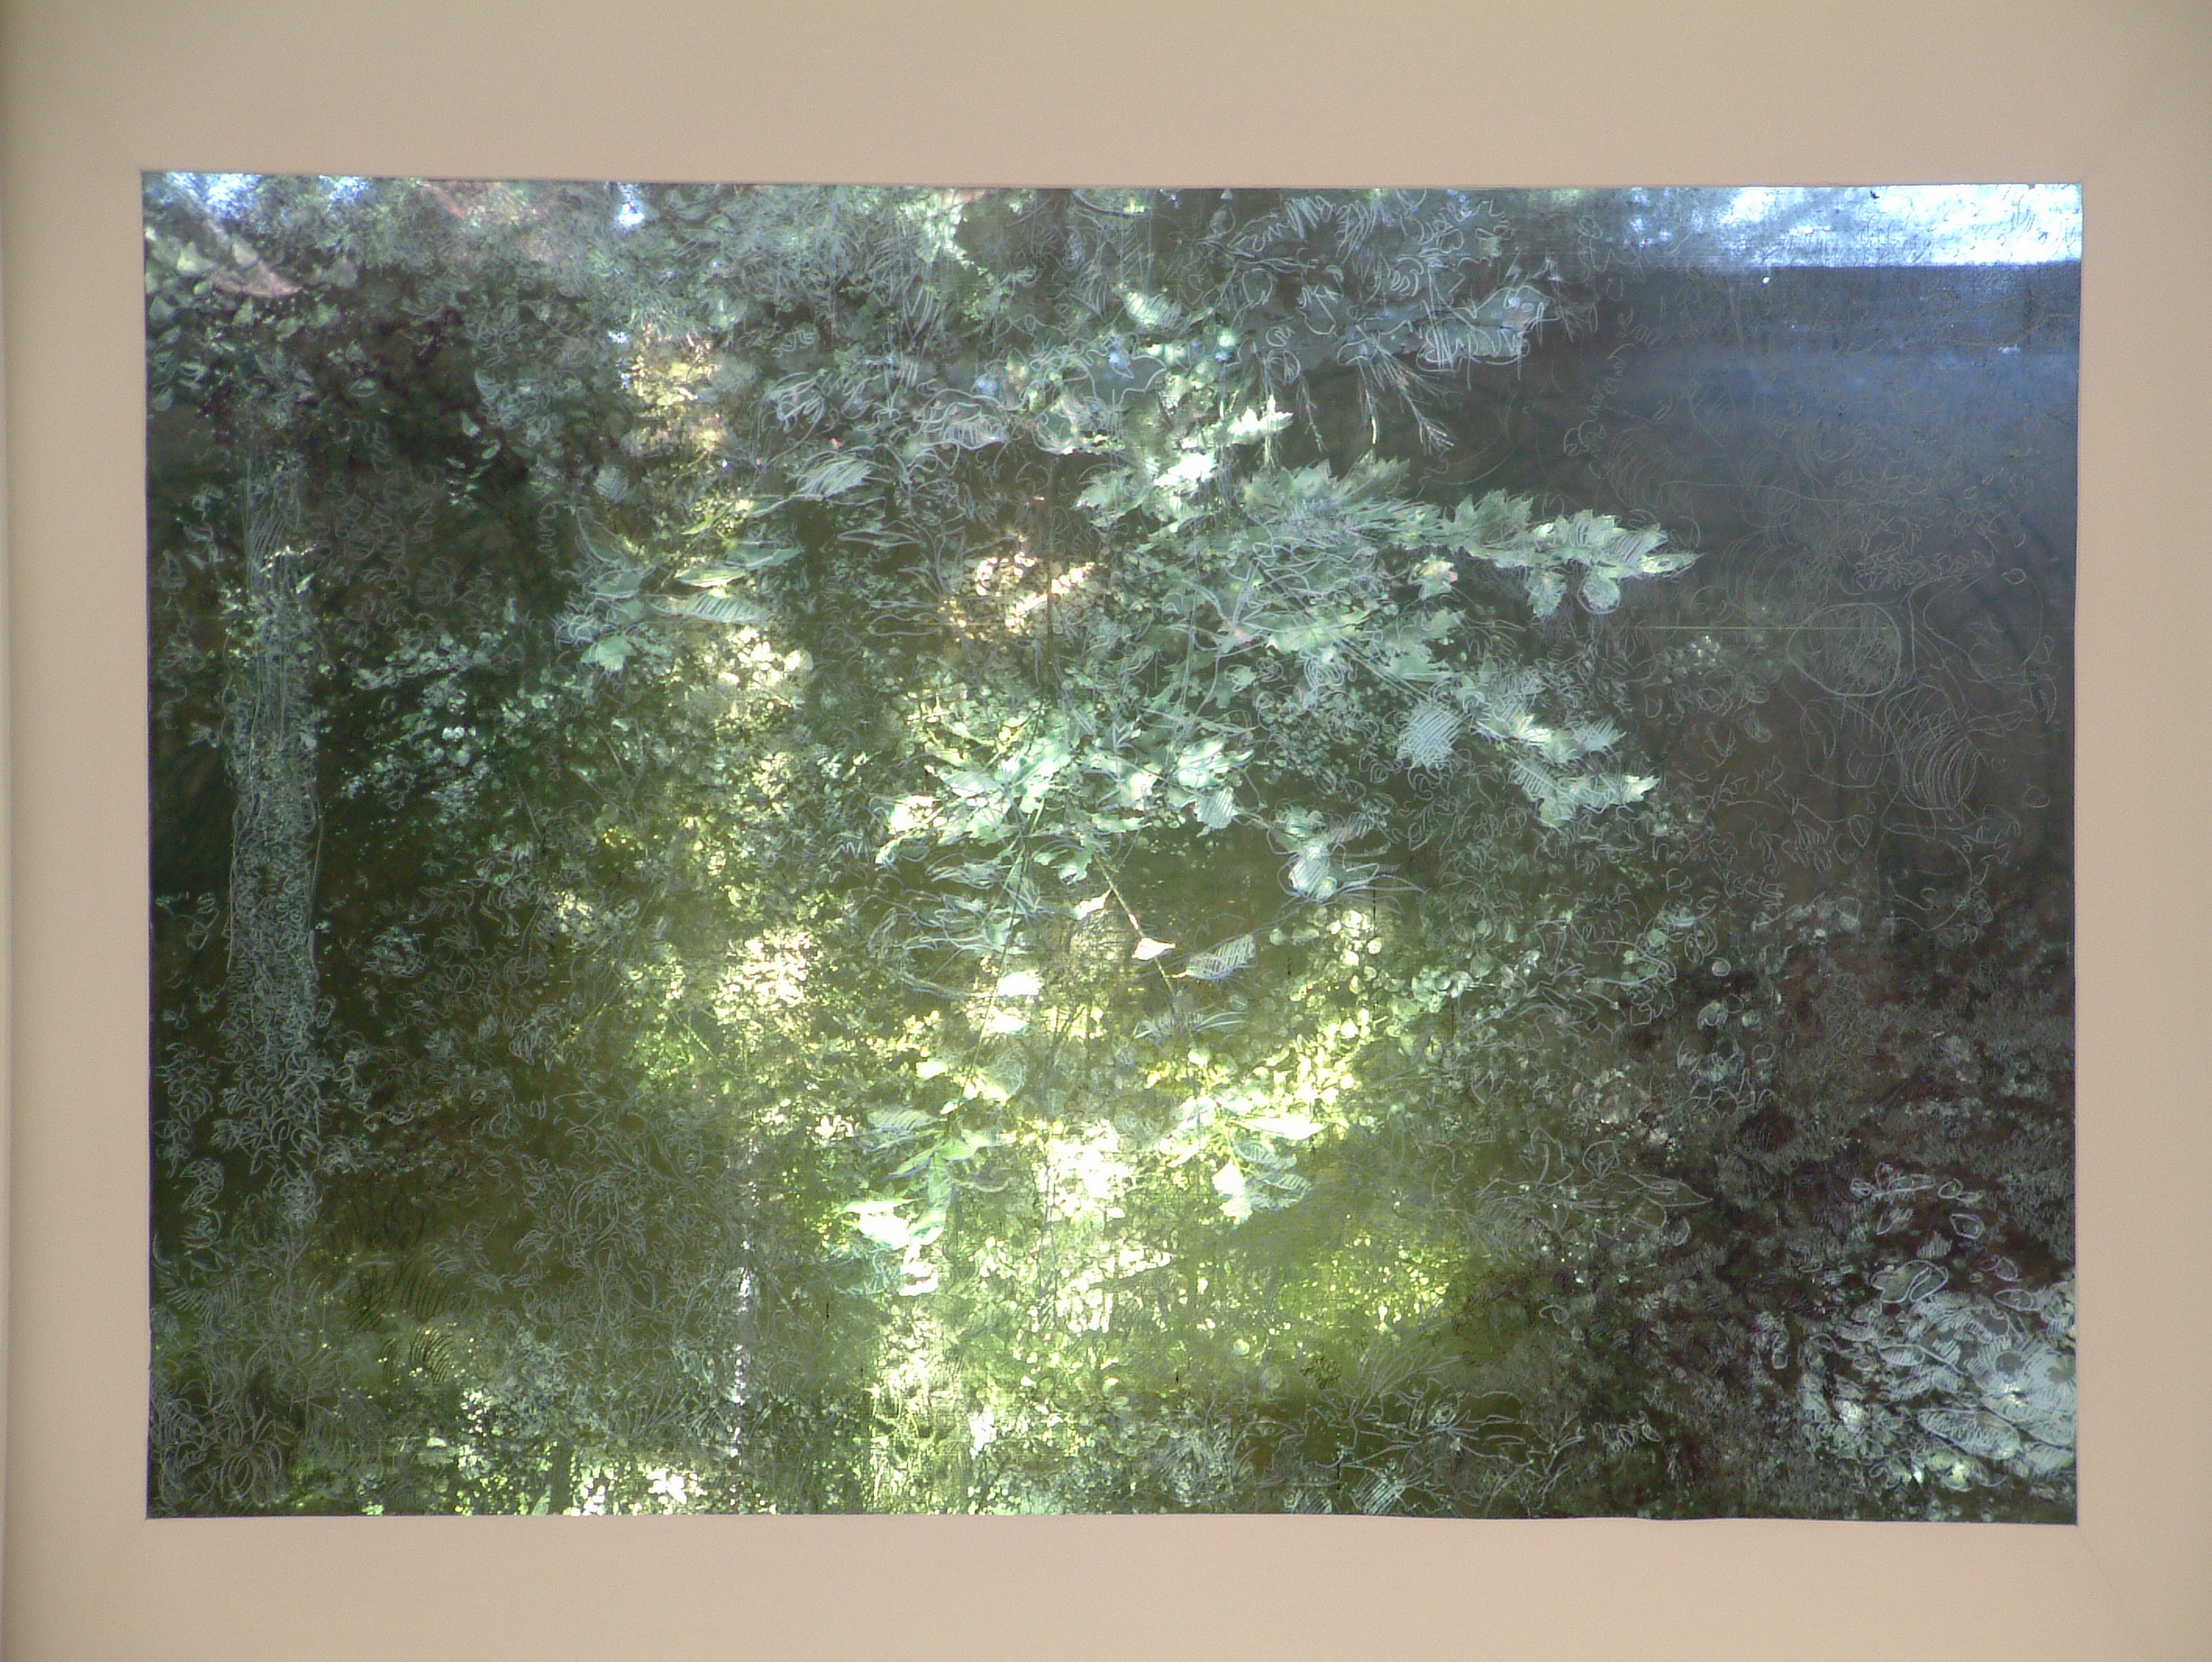 rohini-devasher-copyright-outside-in-2004 (7)